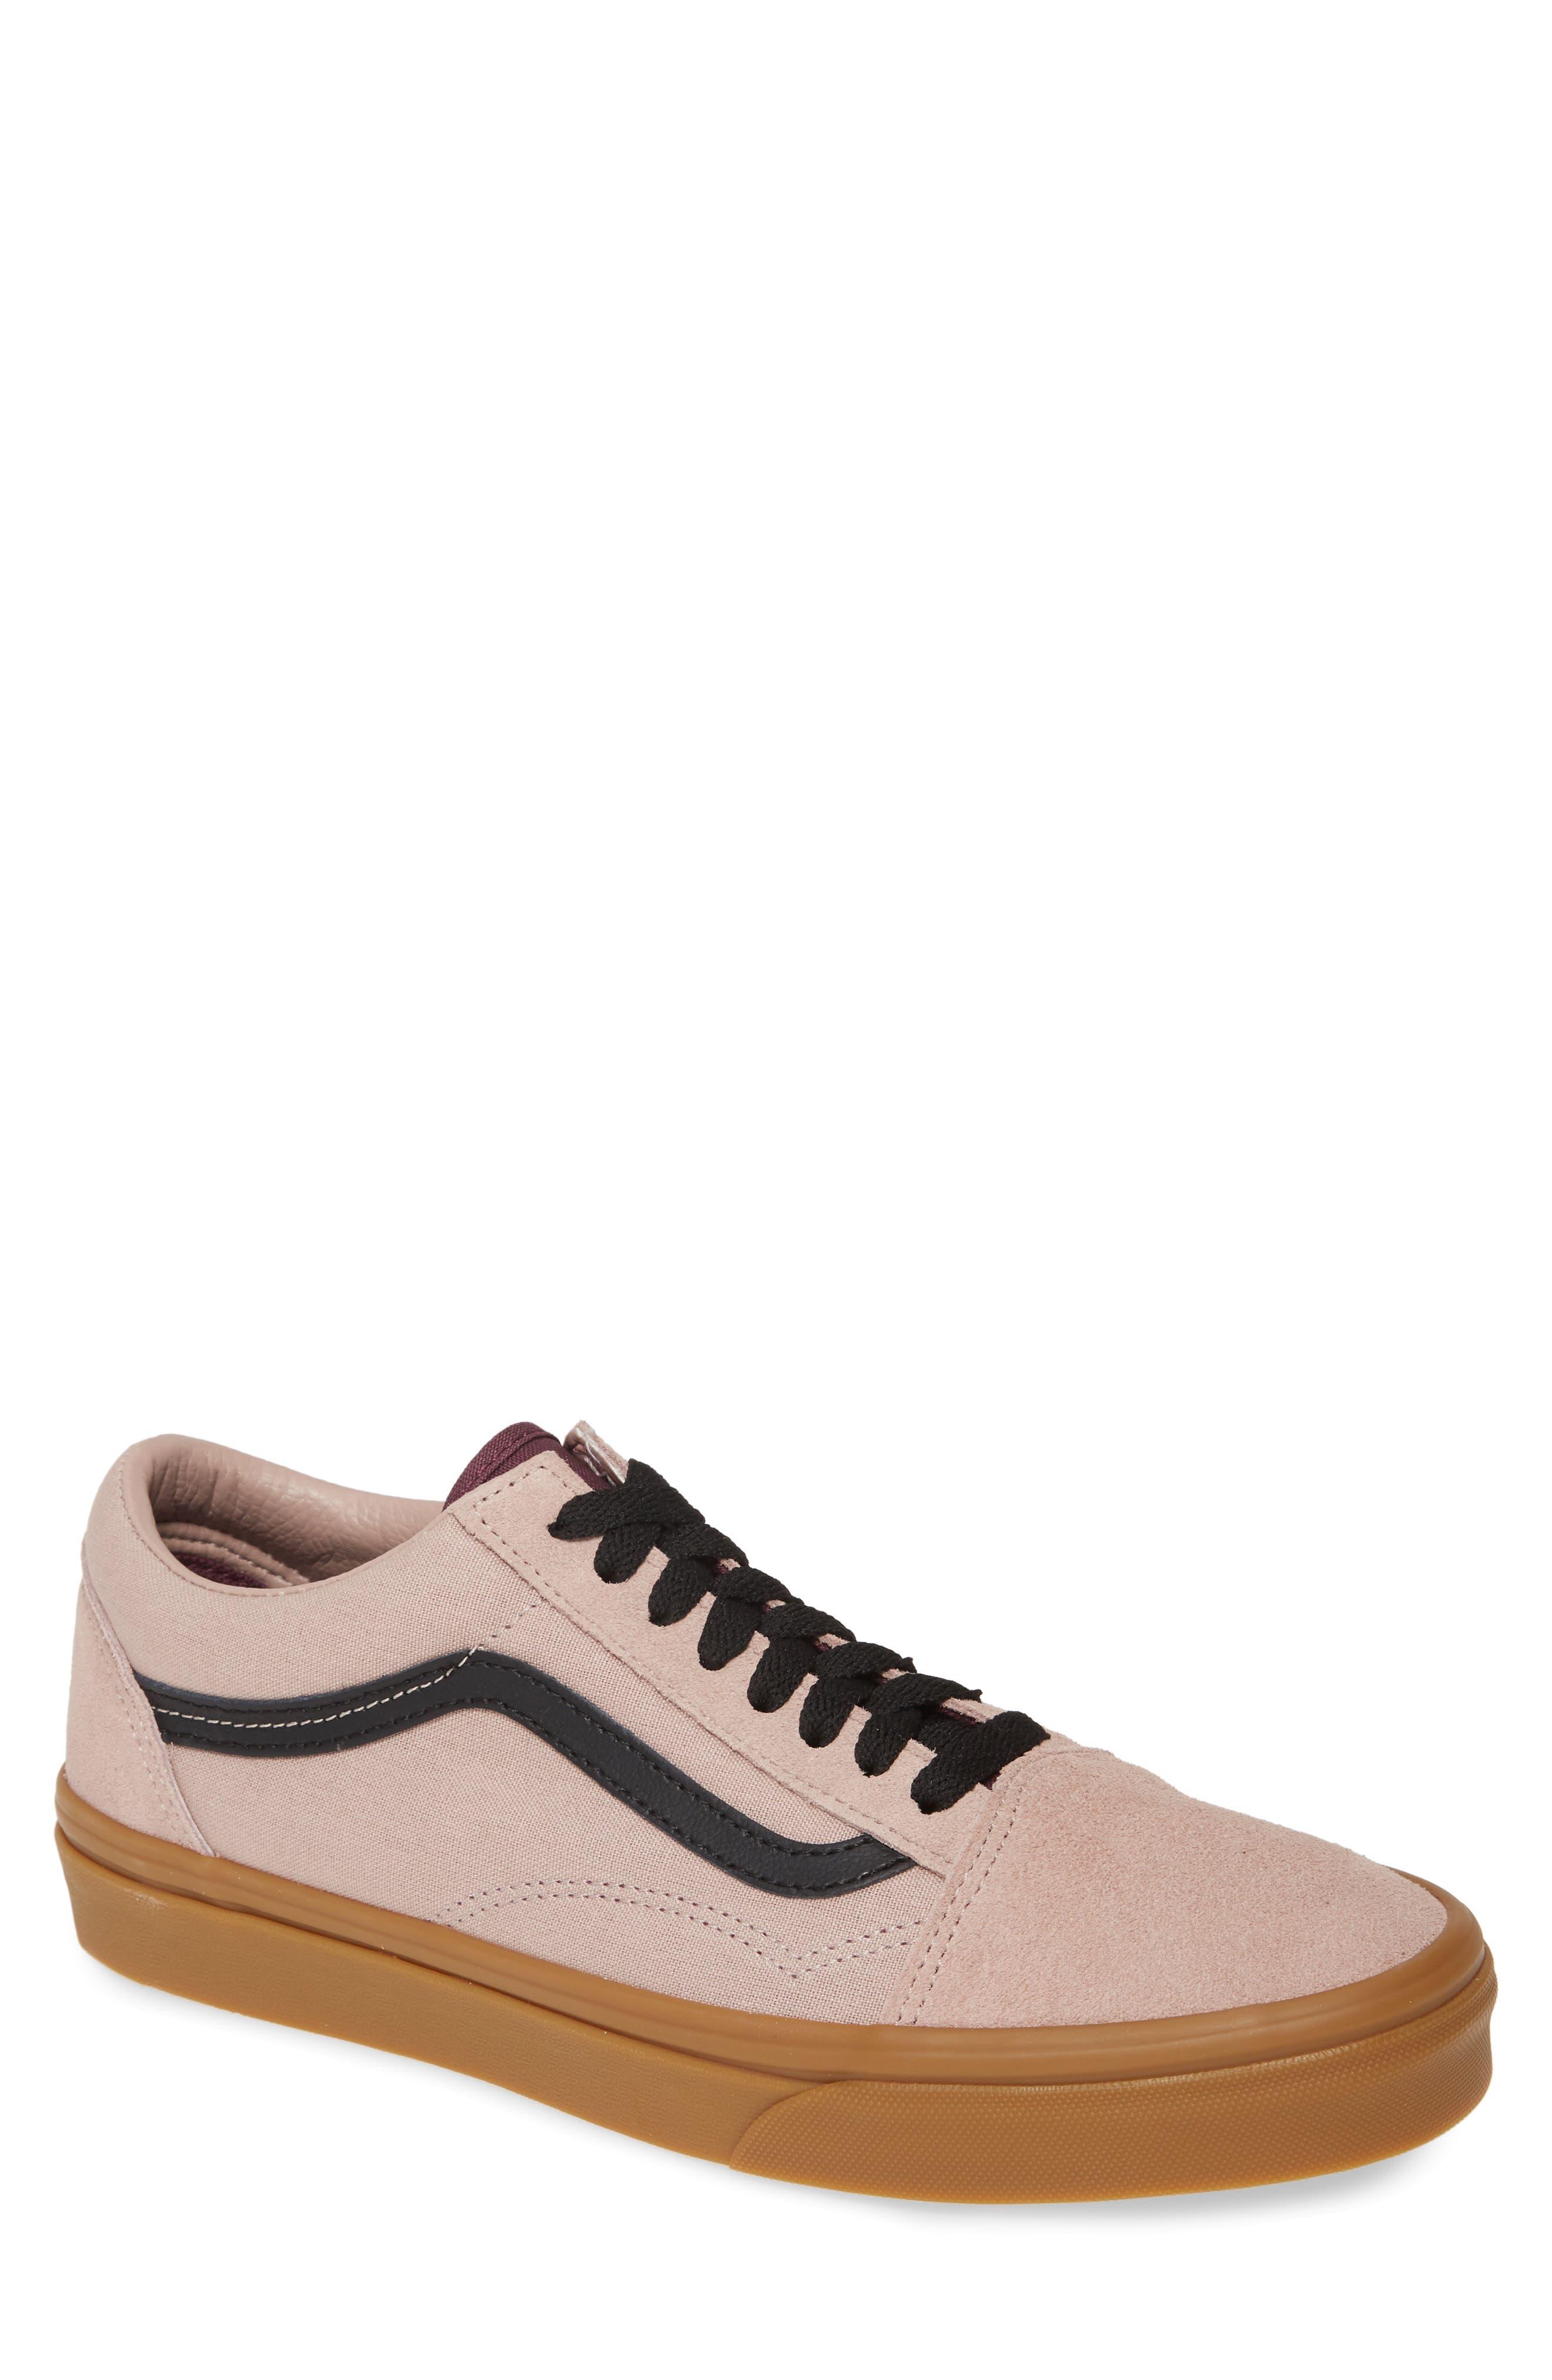 Topman & Trend Shoes for Men | Nordstrom